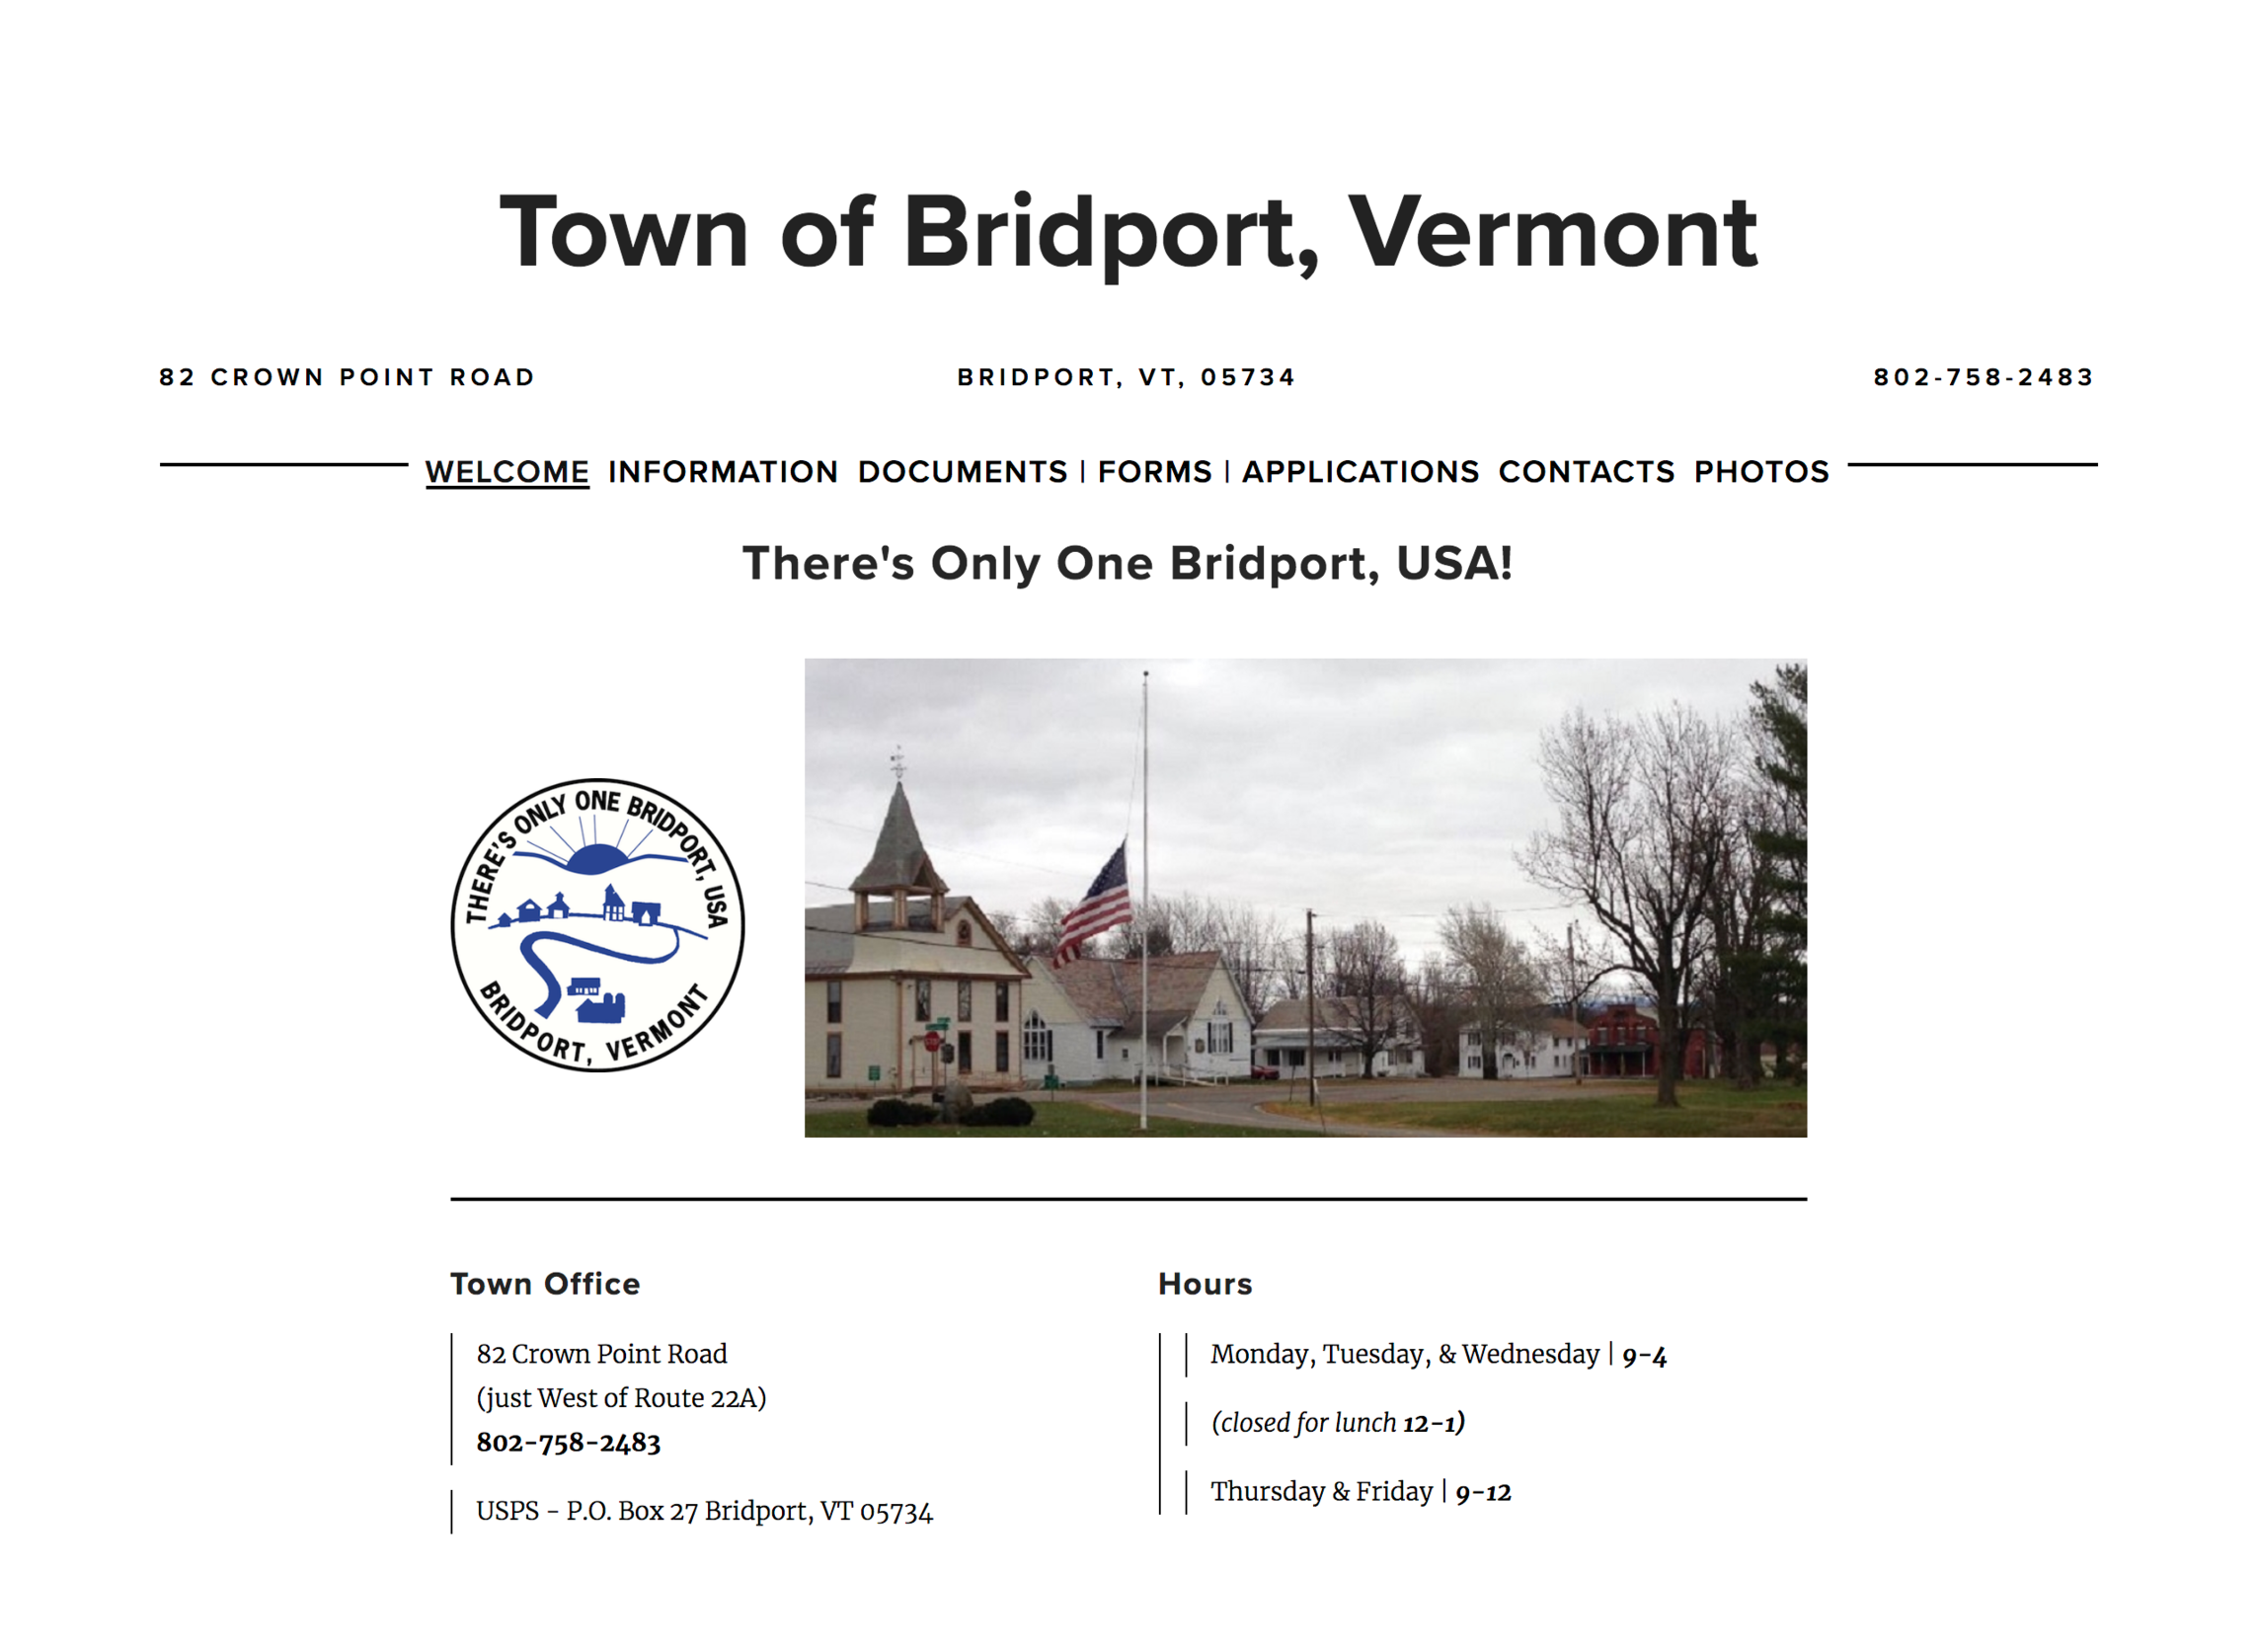 Town of Bridport Vermont